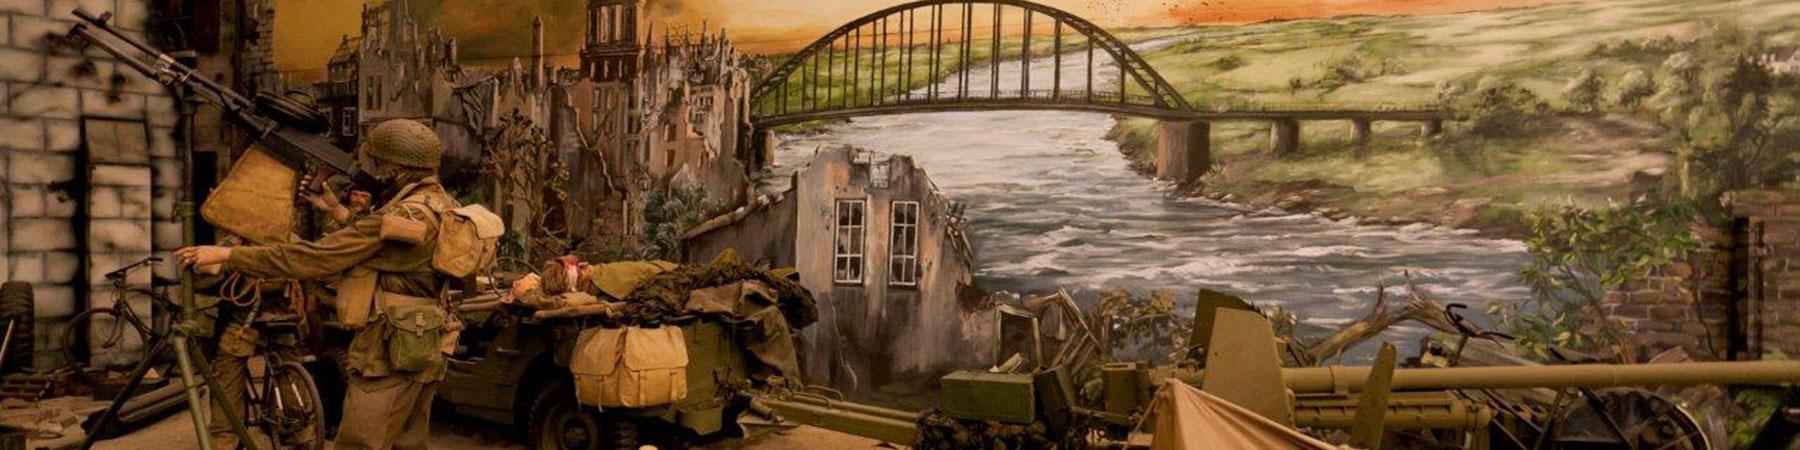 oorlogsmuseum-overloon2